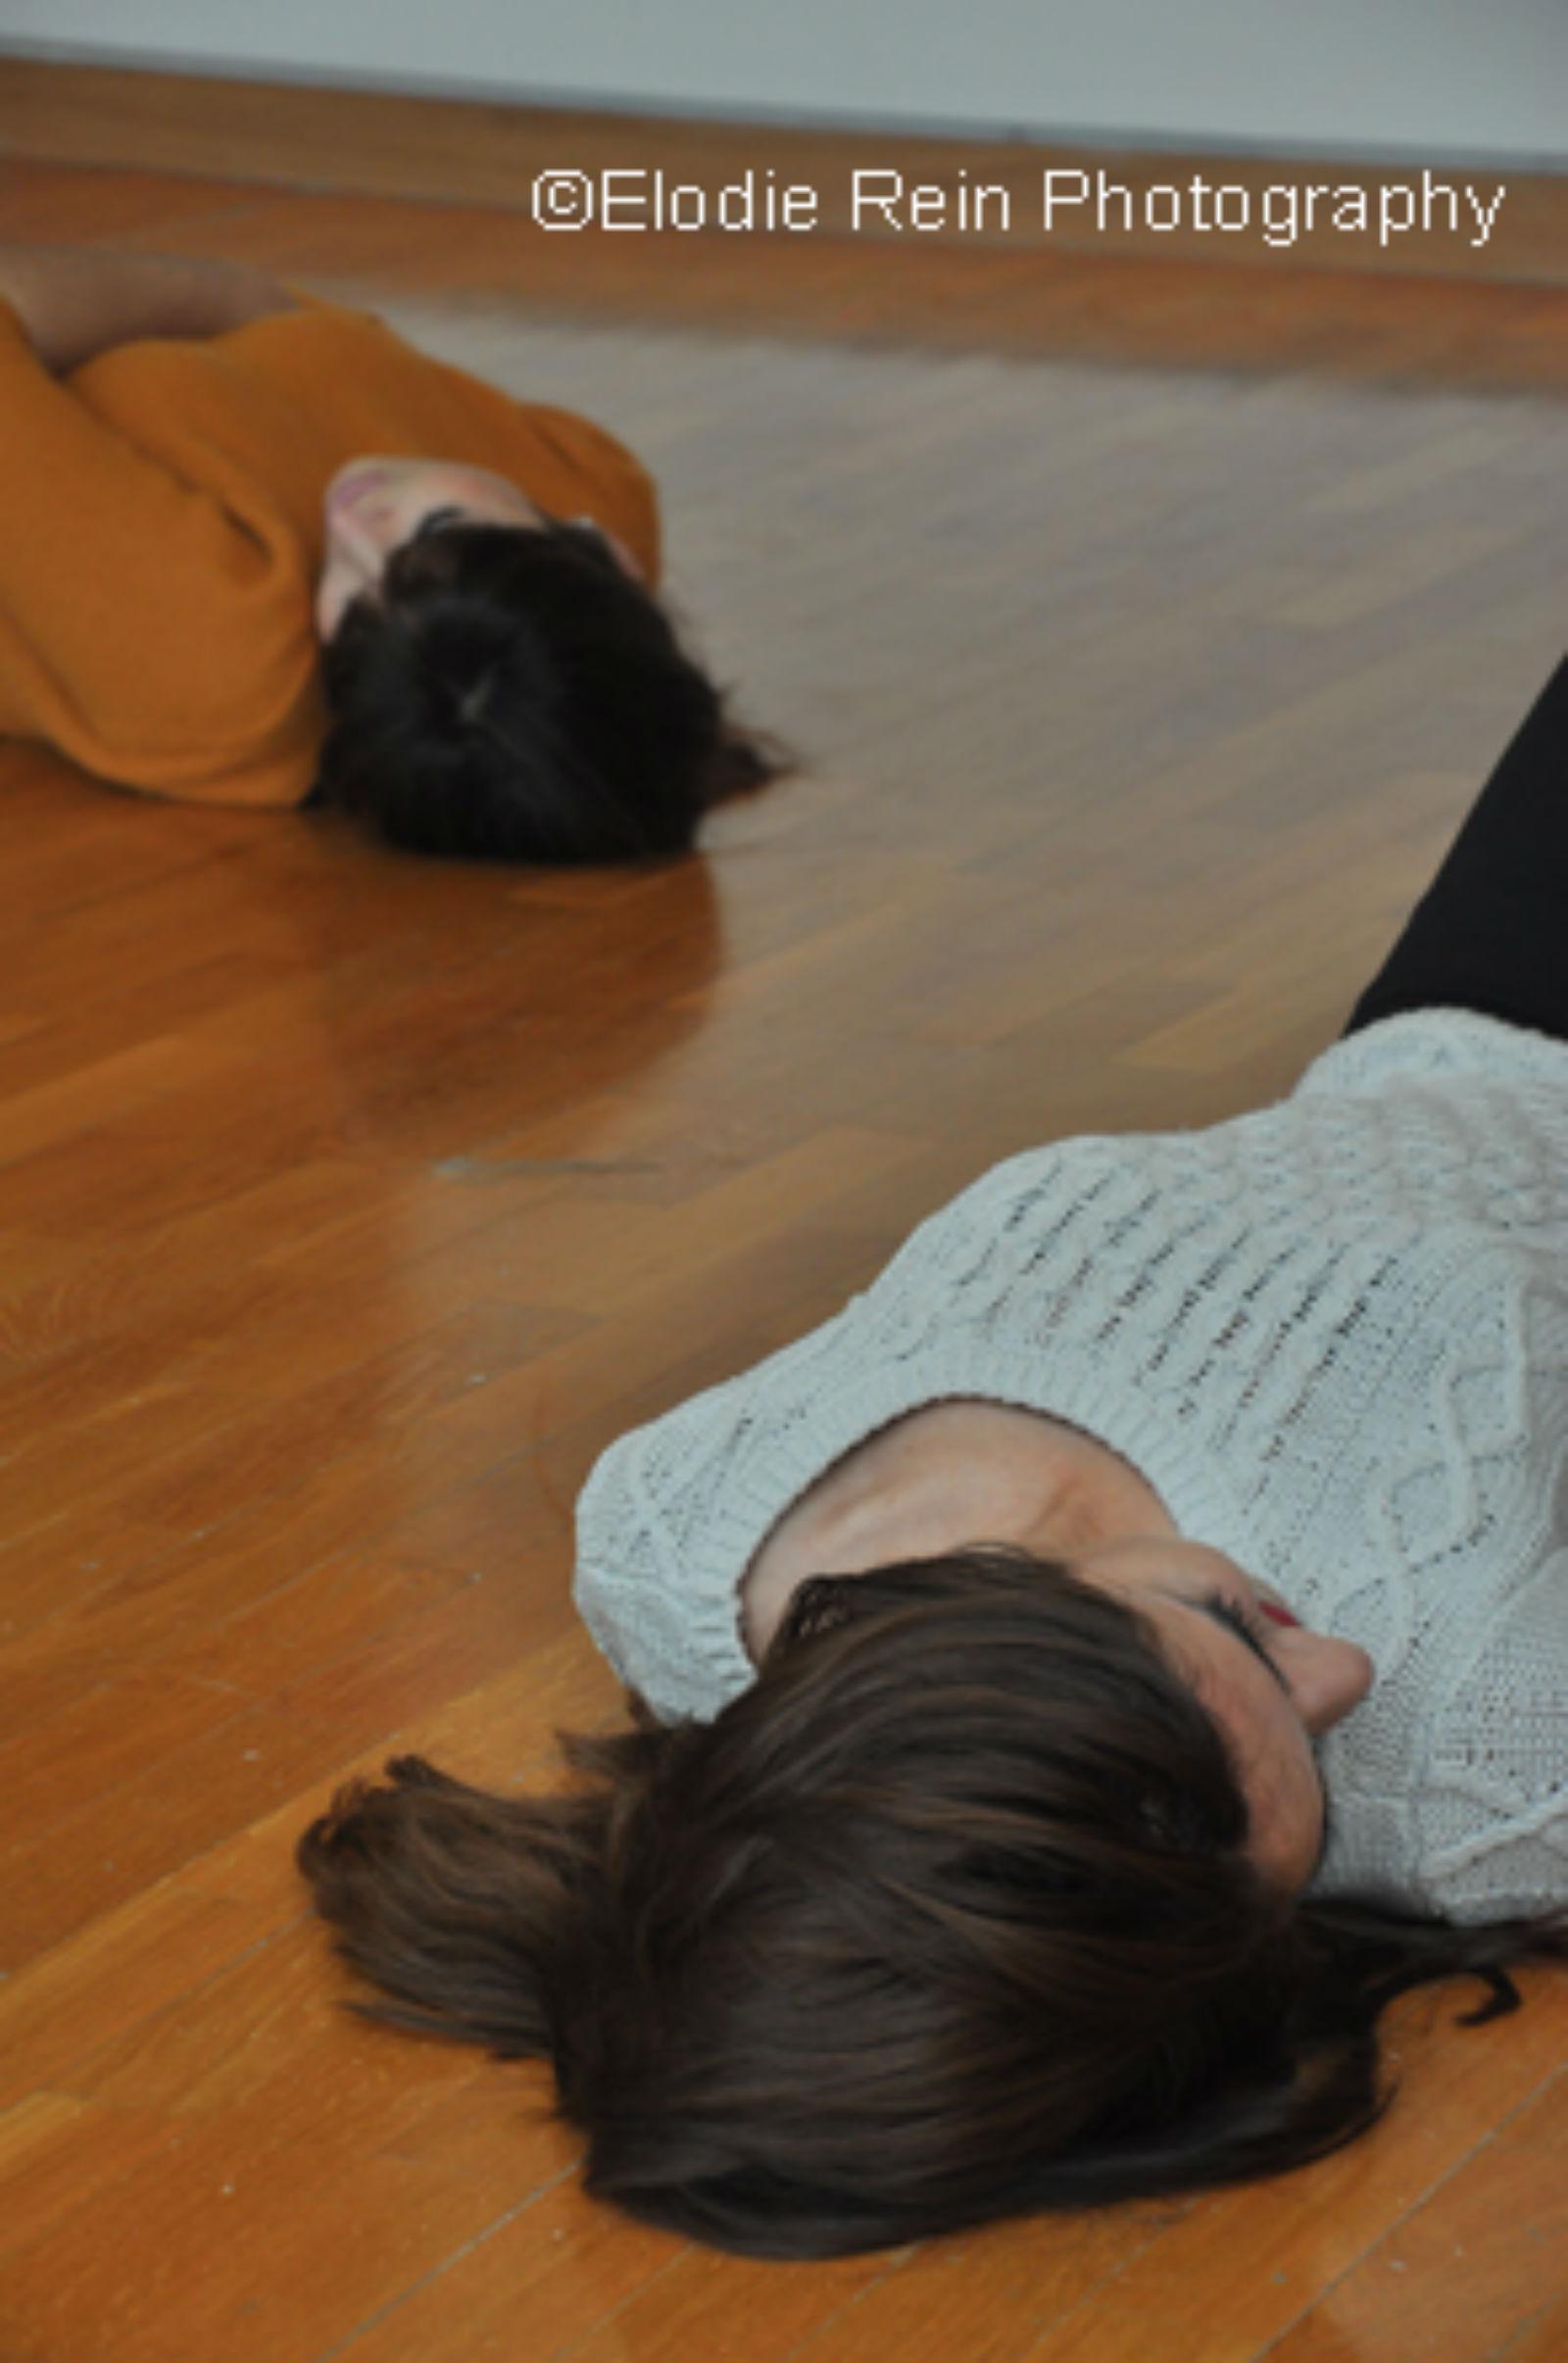 @DanceDates2-studentsinmuseum-byElodieRein ready